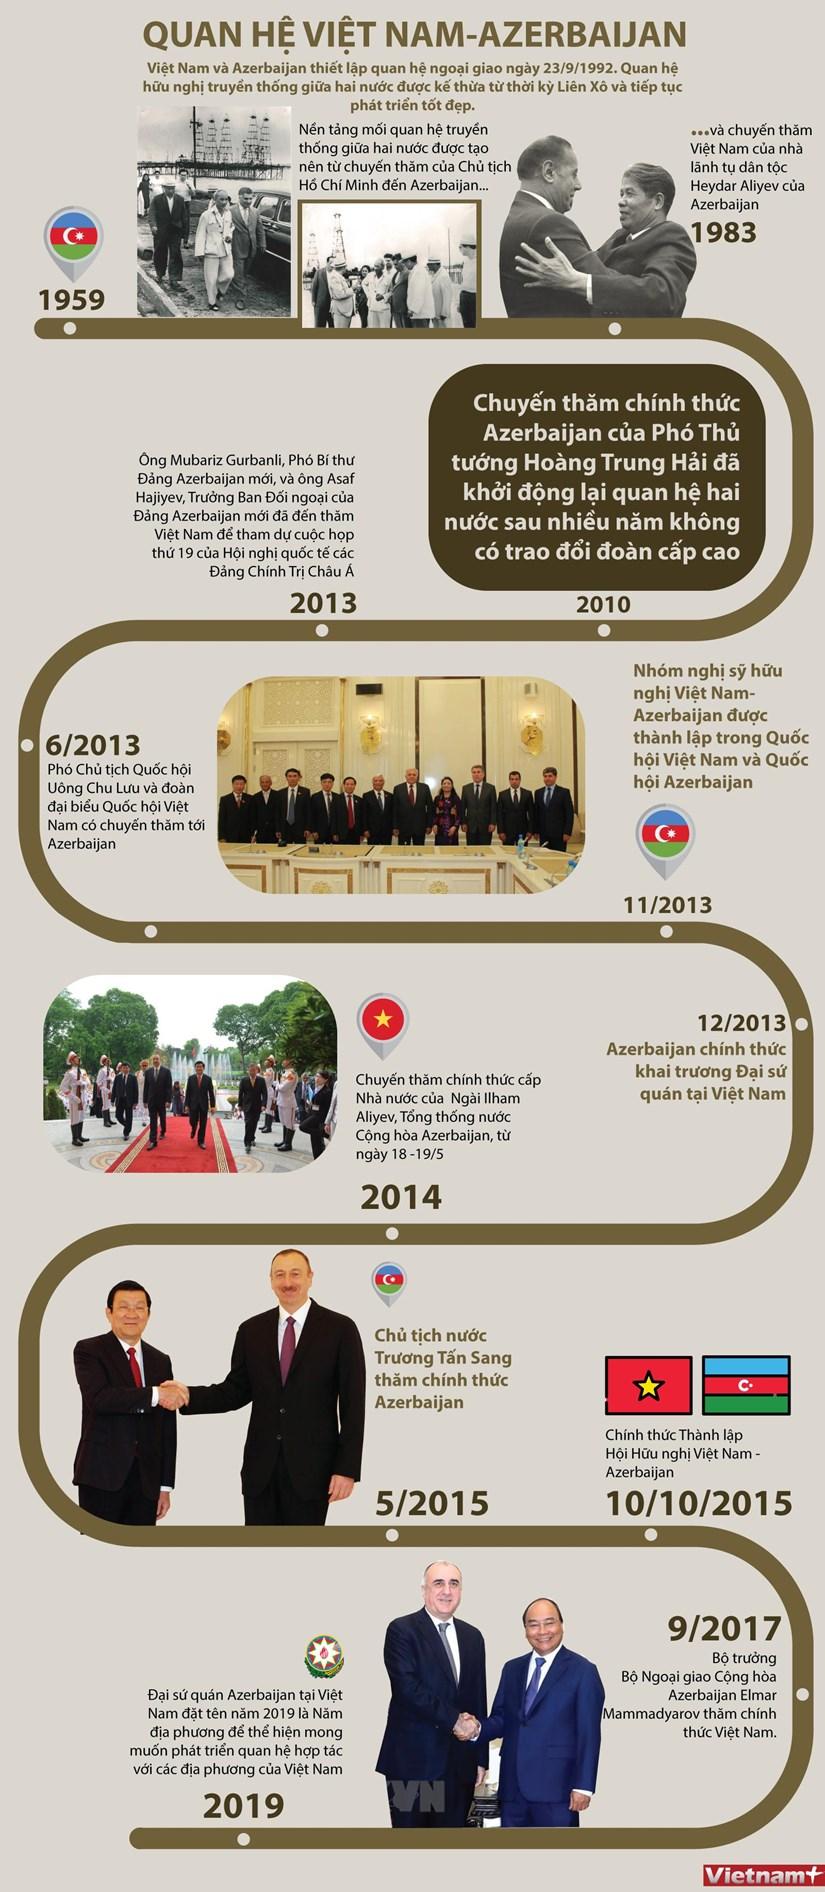 [Infographics] Quan he Viet Nam-Azerbaijan phat trien tot dep hinh anh 1